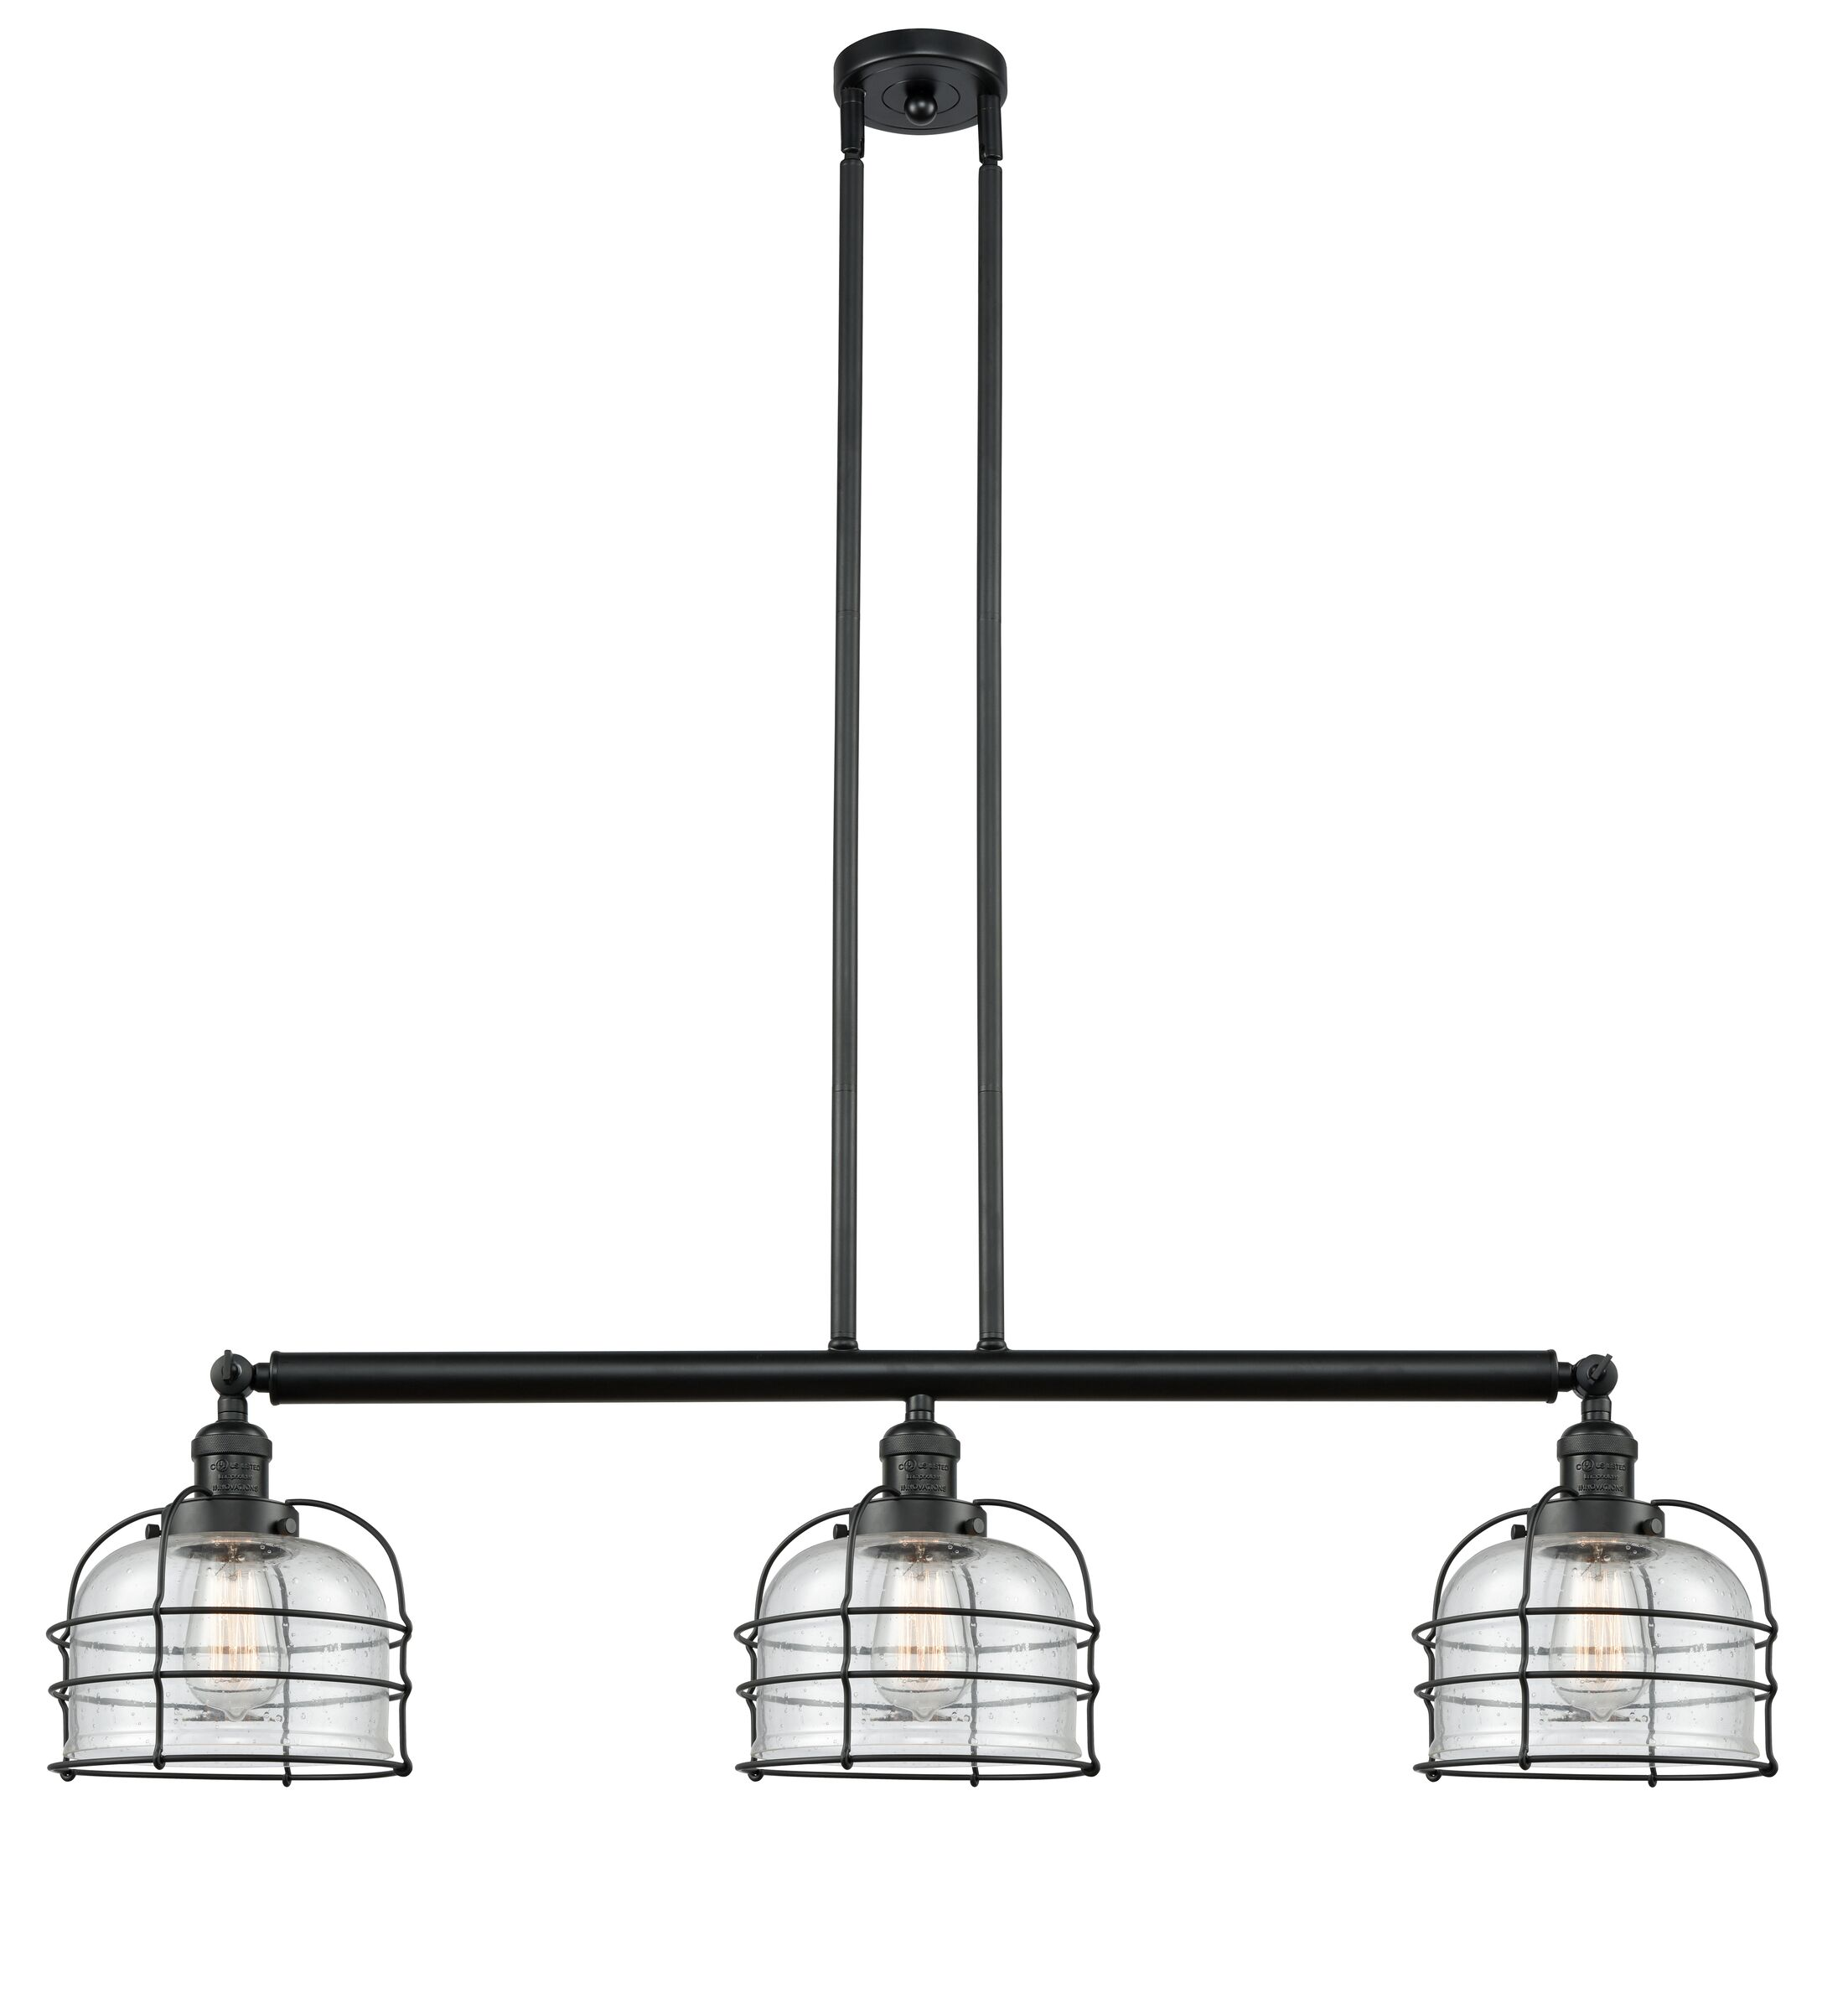 Mixon 3-Light Kitchen Island Pendant Shade Color: Matte White Cased, Bulb Type: LED